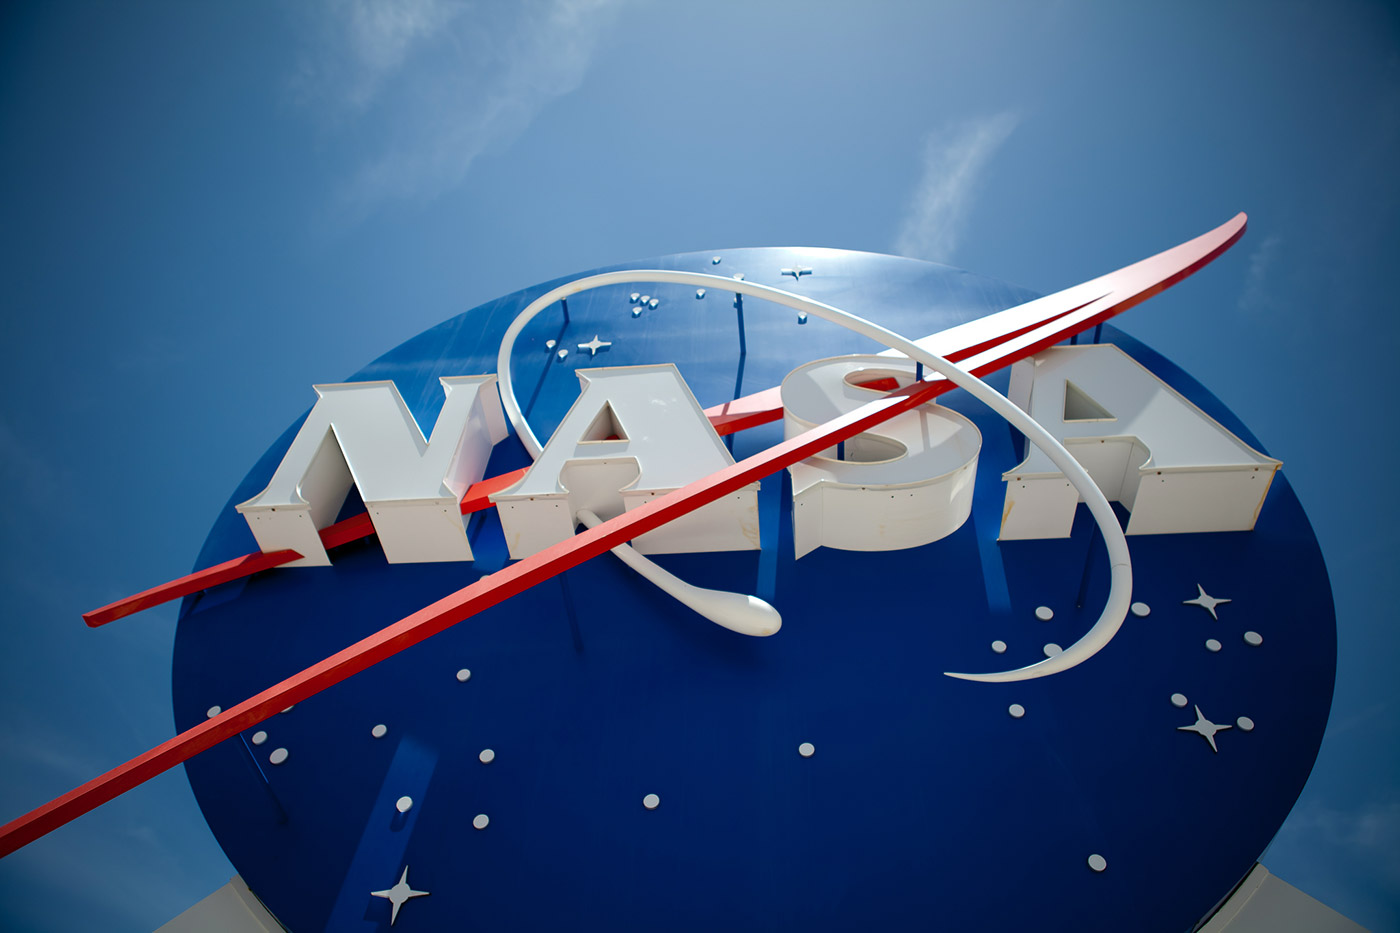 NASA signage meatball